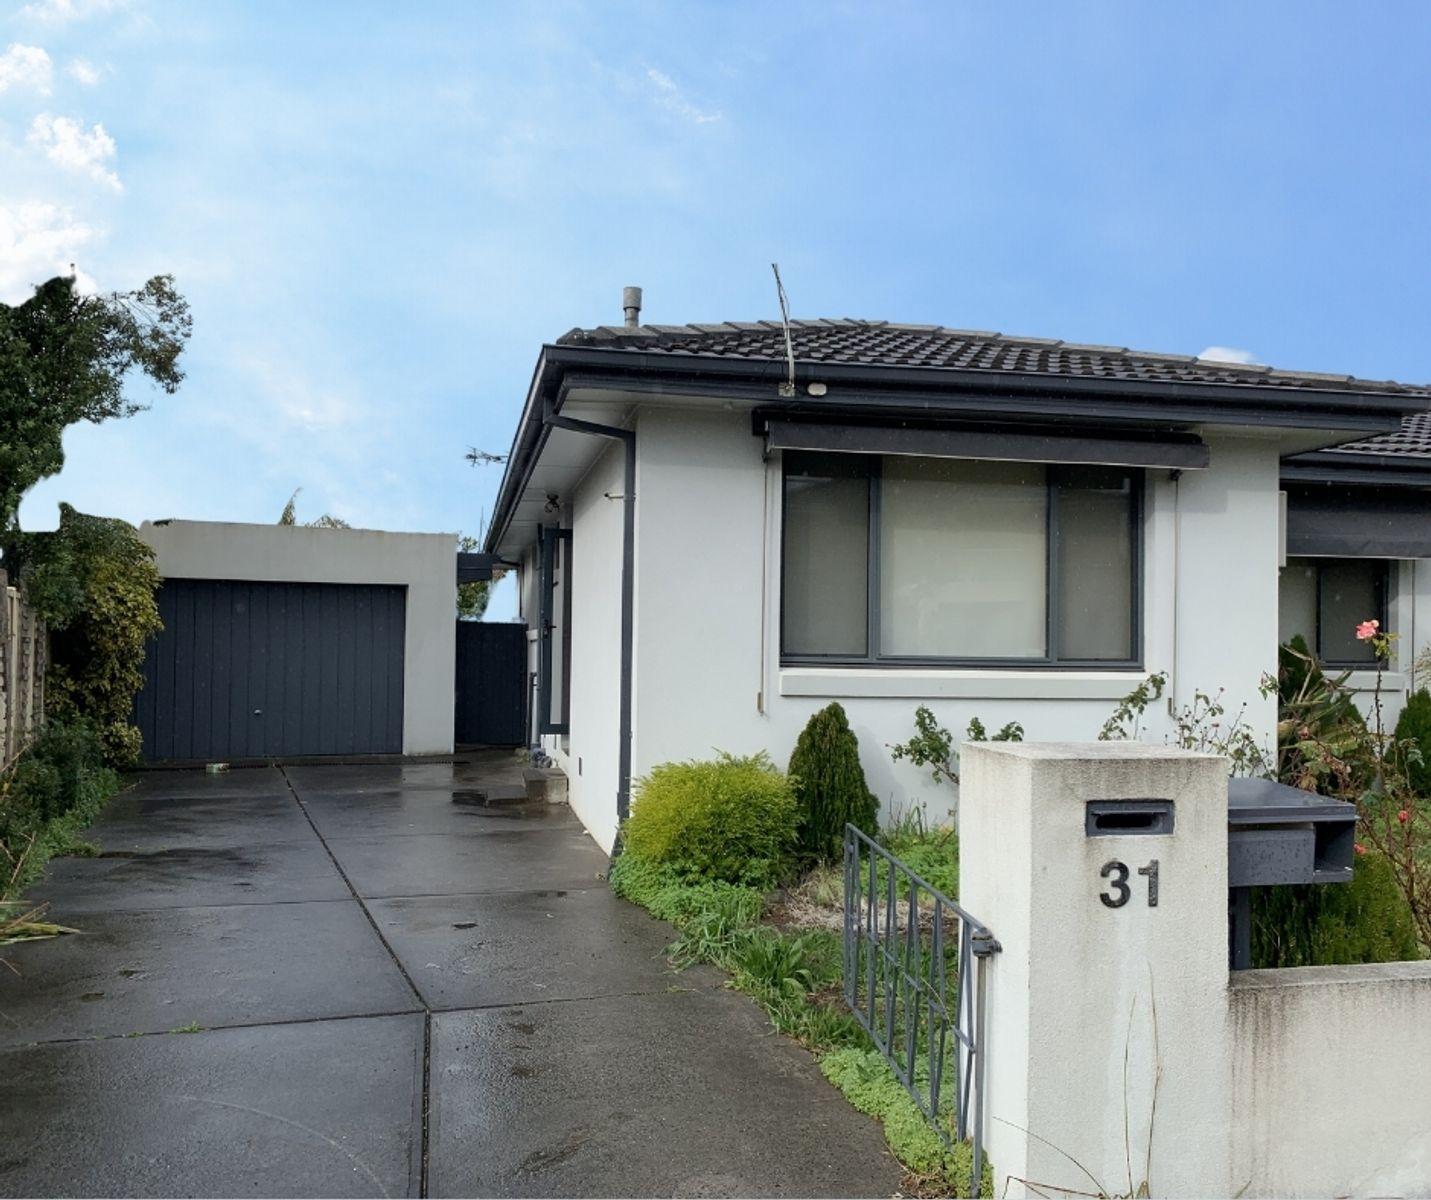 31 Woodlee Street, Dandenong, VIC 3175